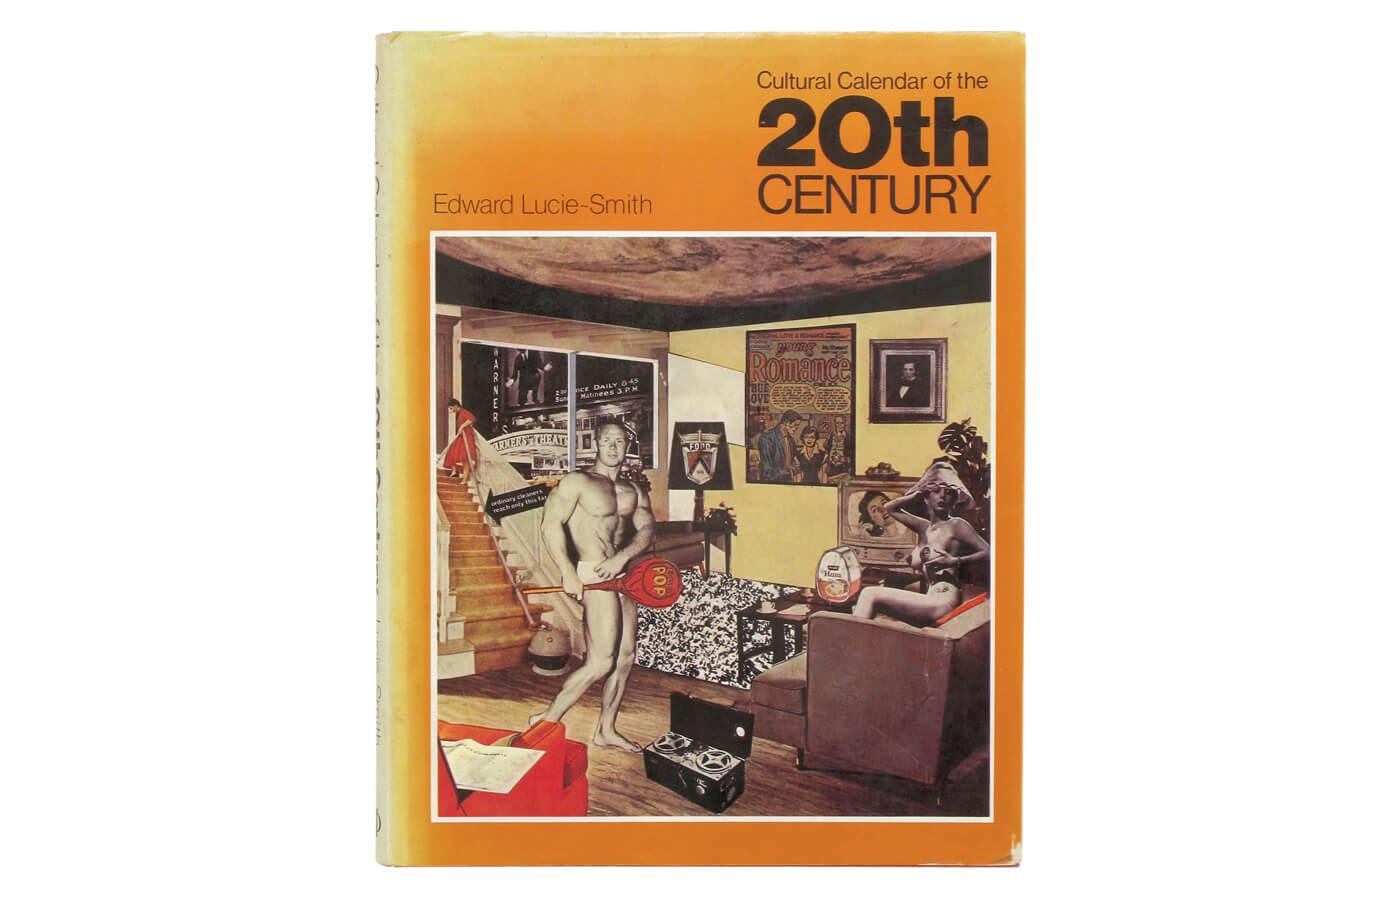 Cultural Calendar of the 20th Century